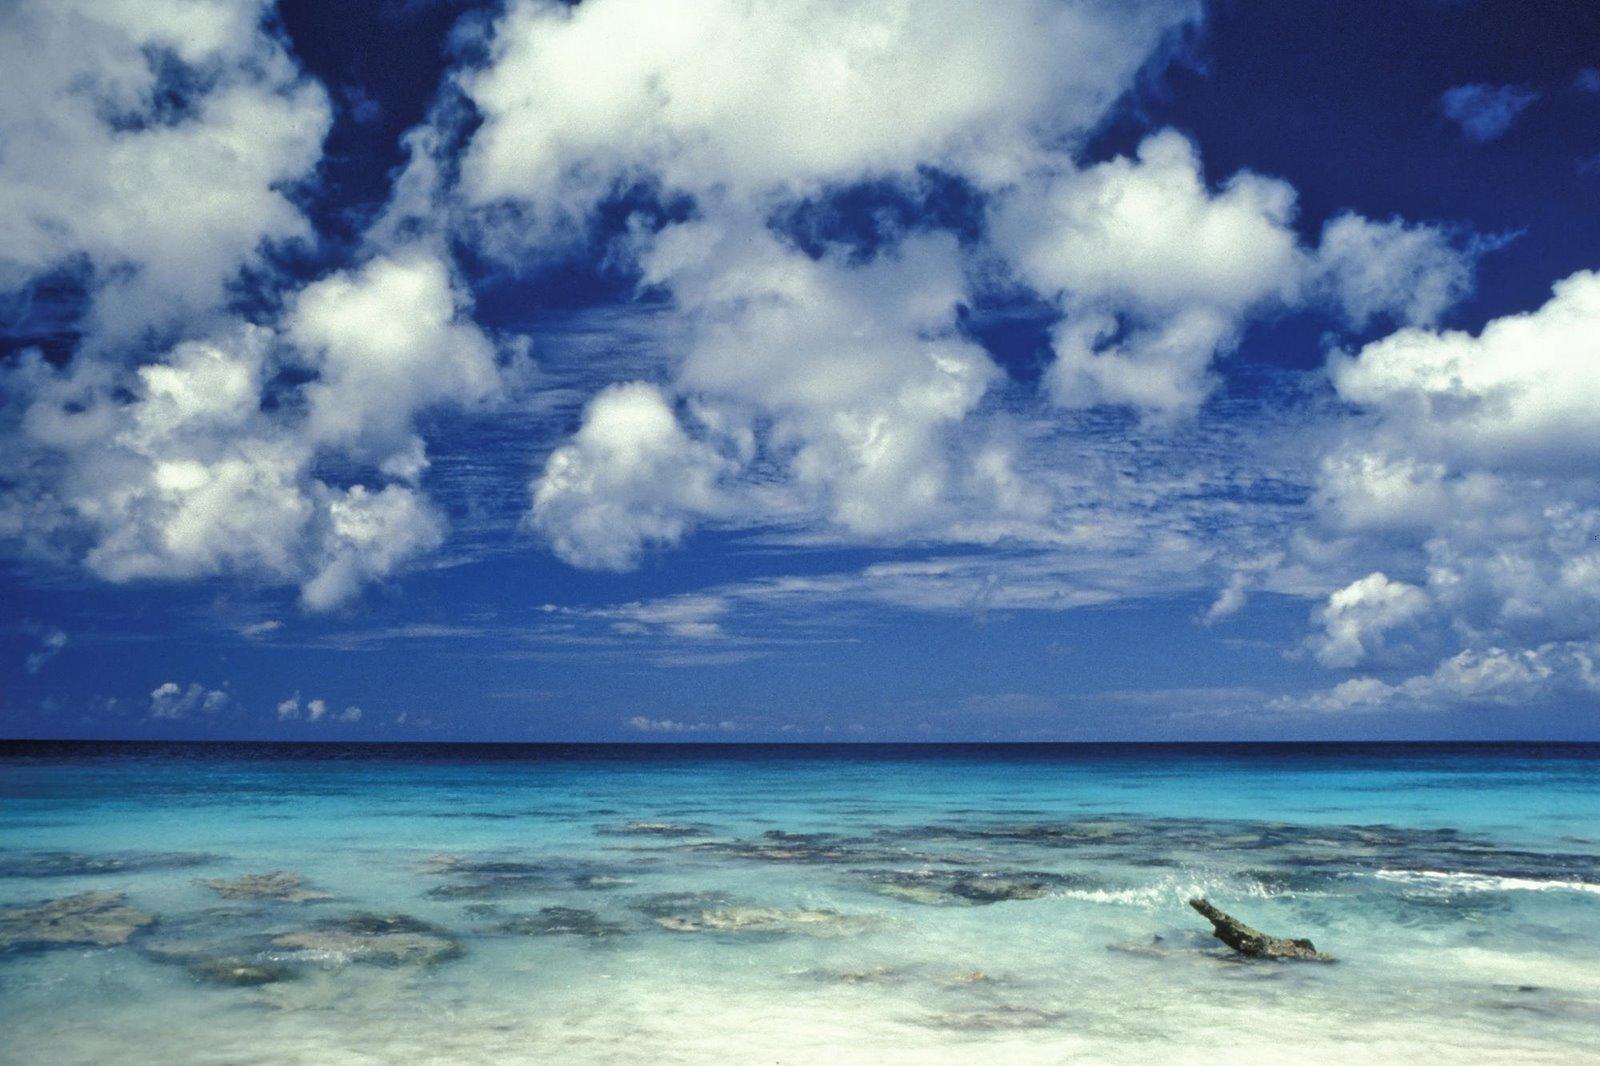 Bonaire PJ4X DX News